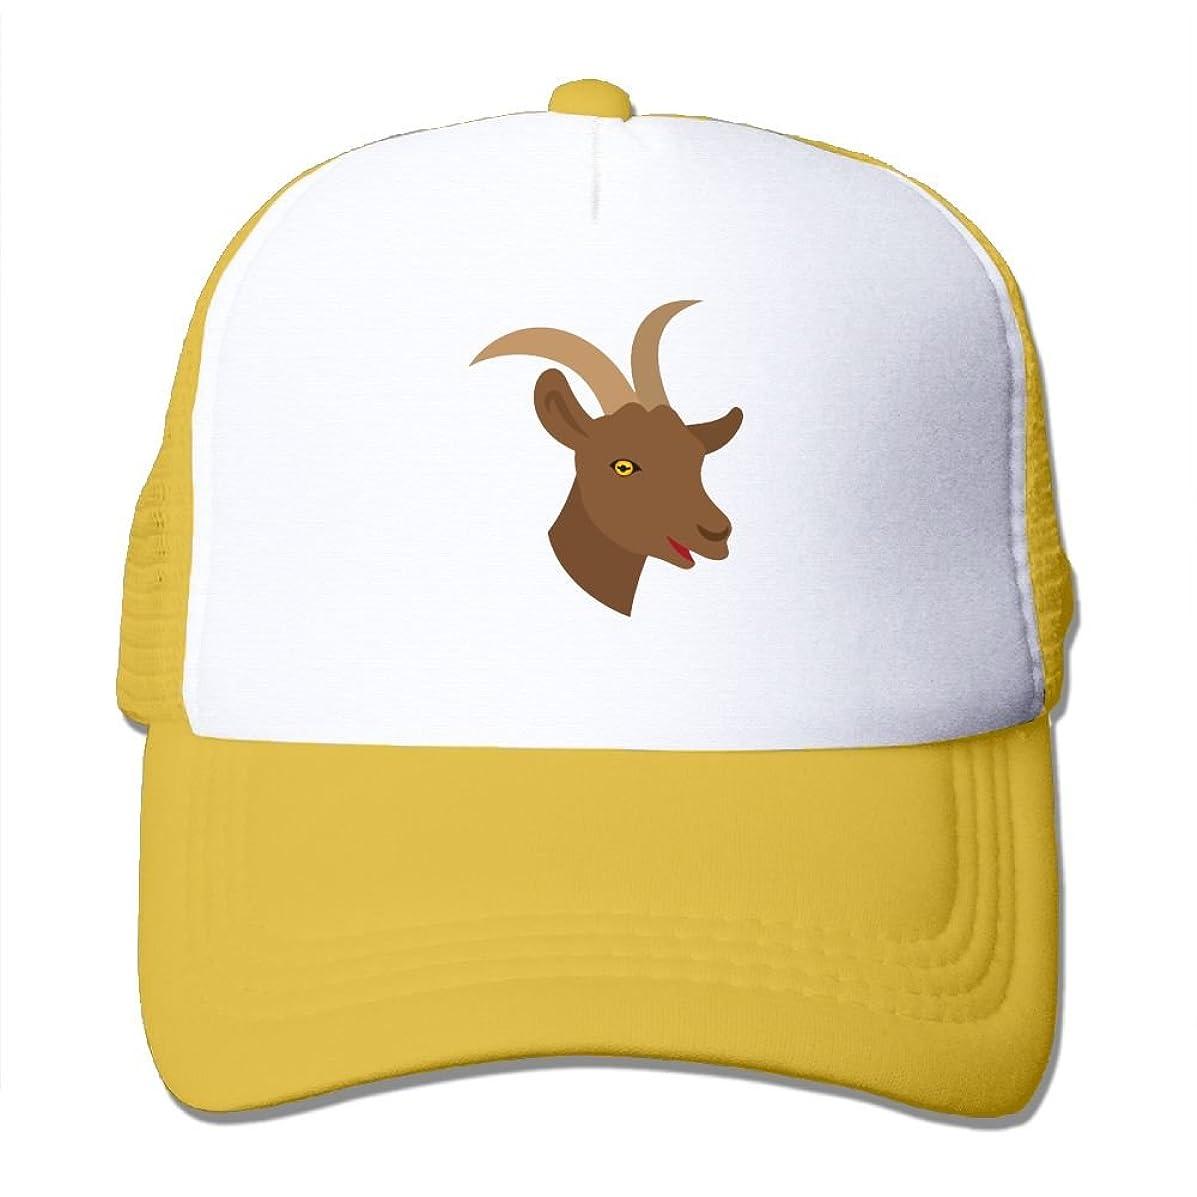 WYF Male Cute Goat Face Outdoor Mesh Hat Golf Sanpback Cap Hat Adjustable Black